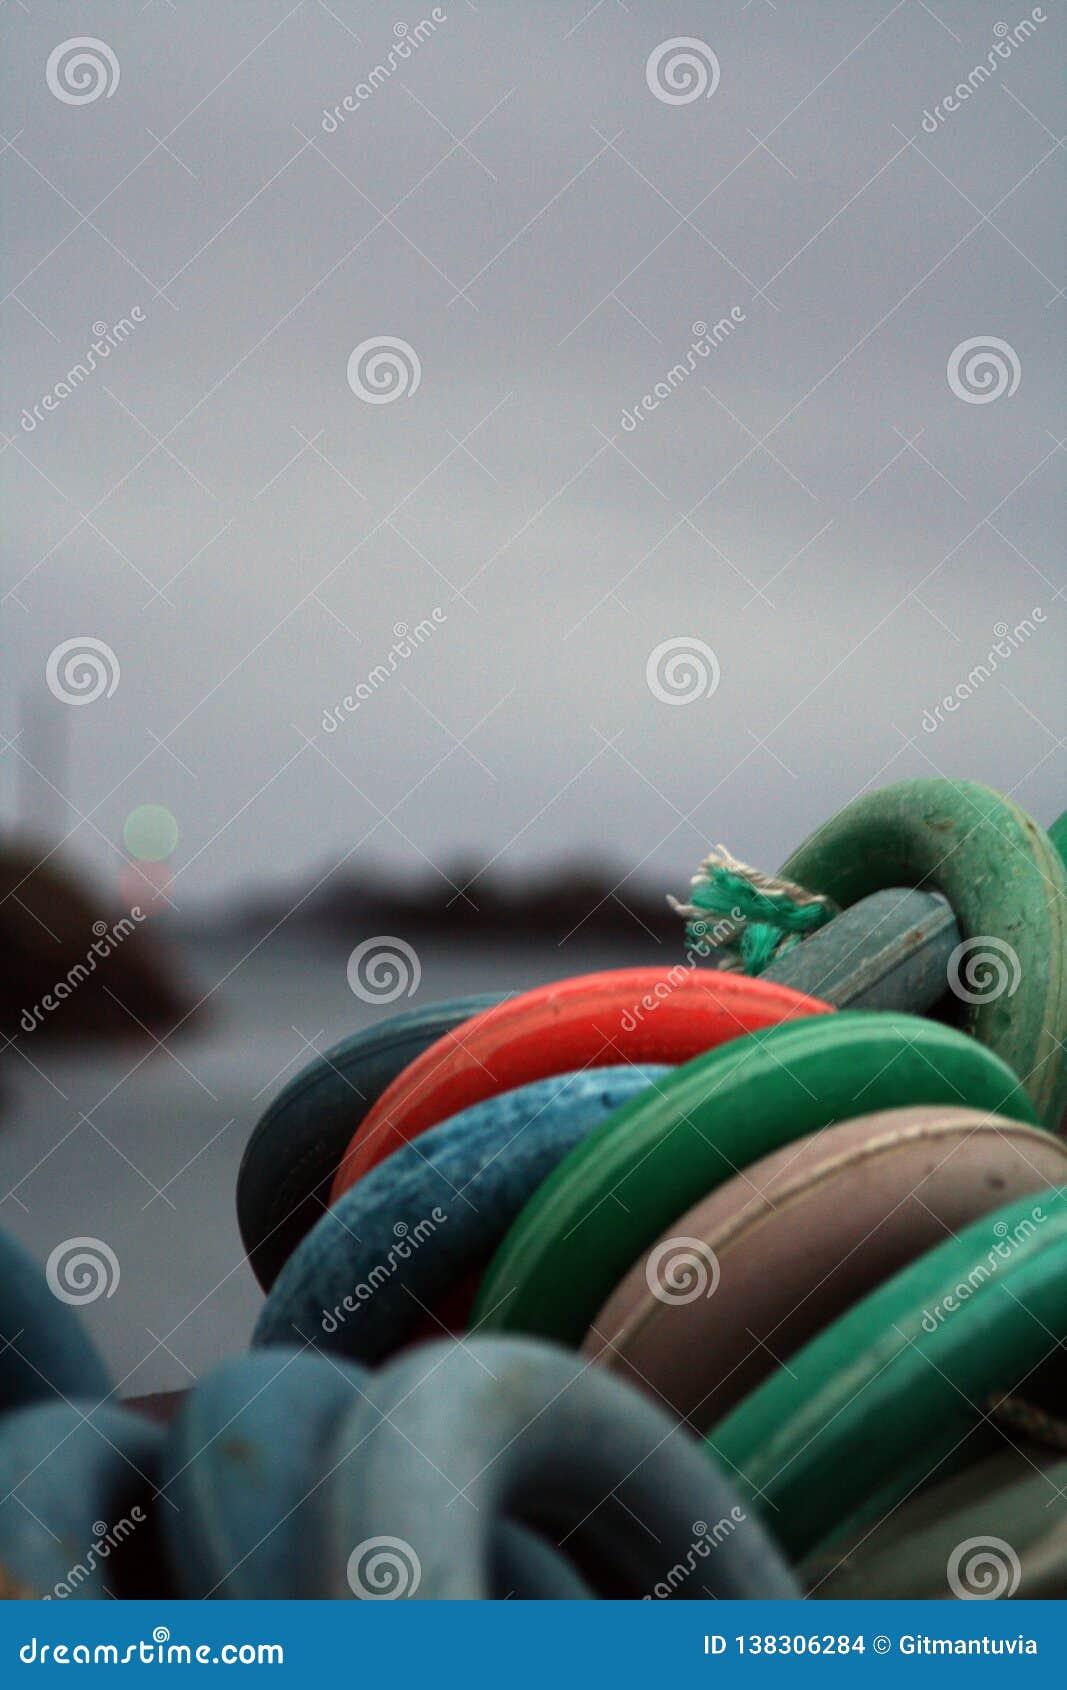 Fishing equipment on the small boat near Lofoten islands-Norway.